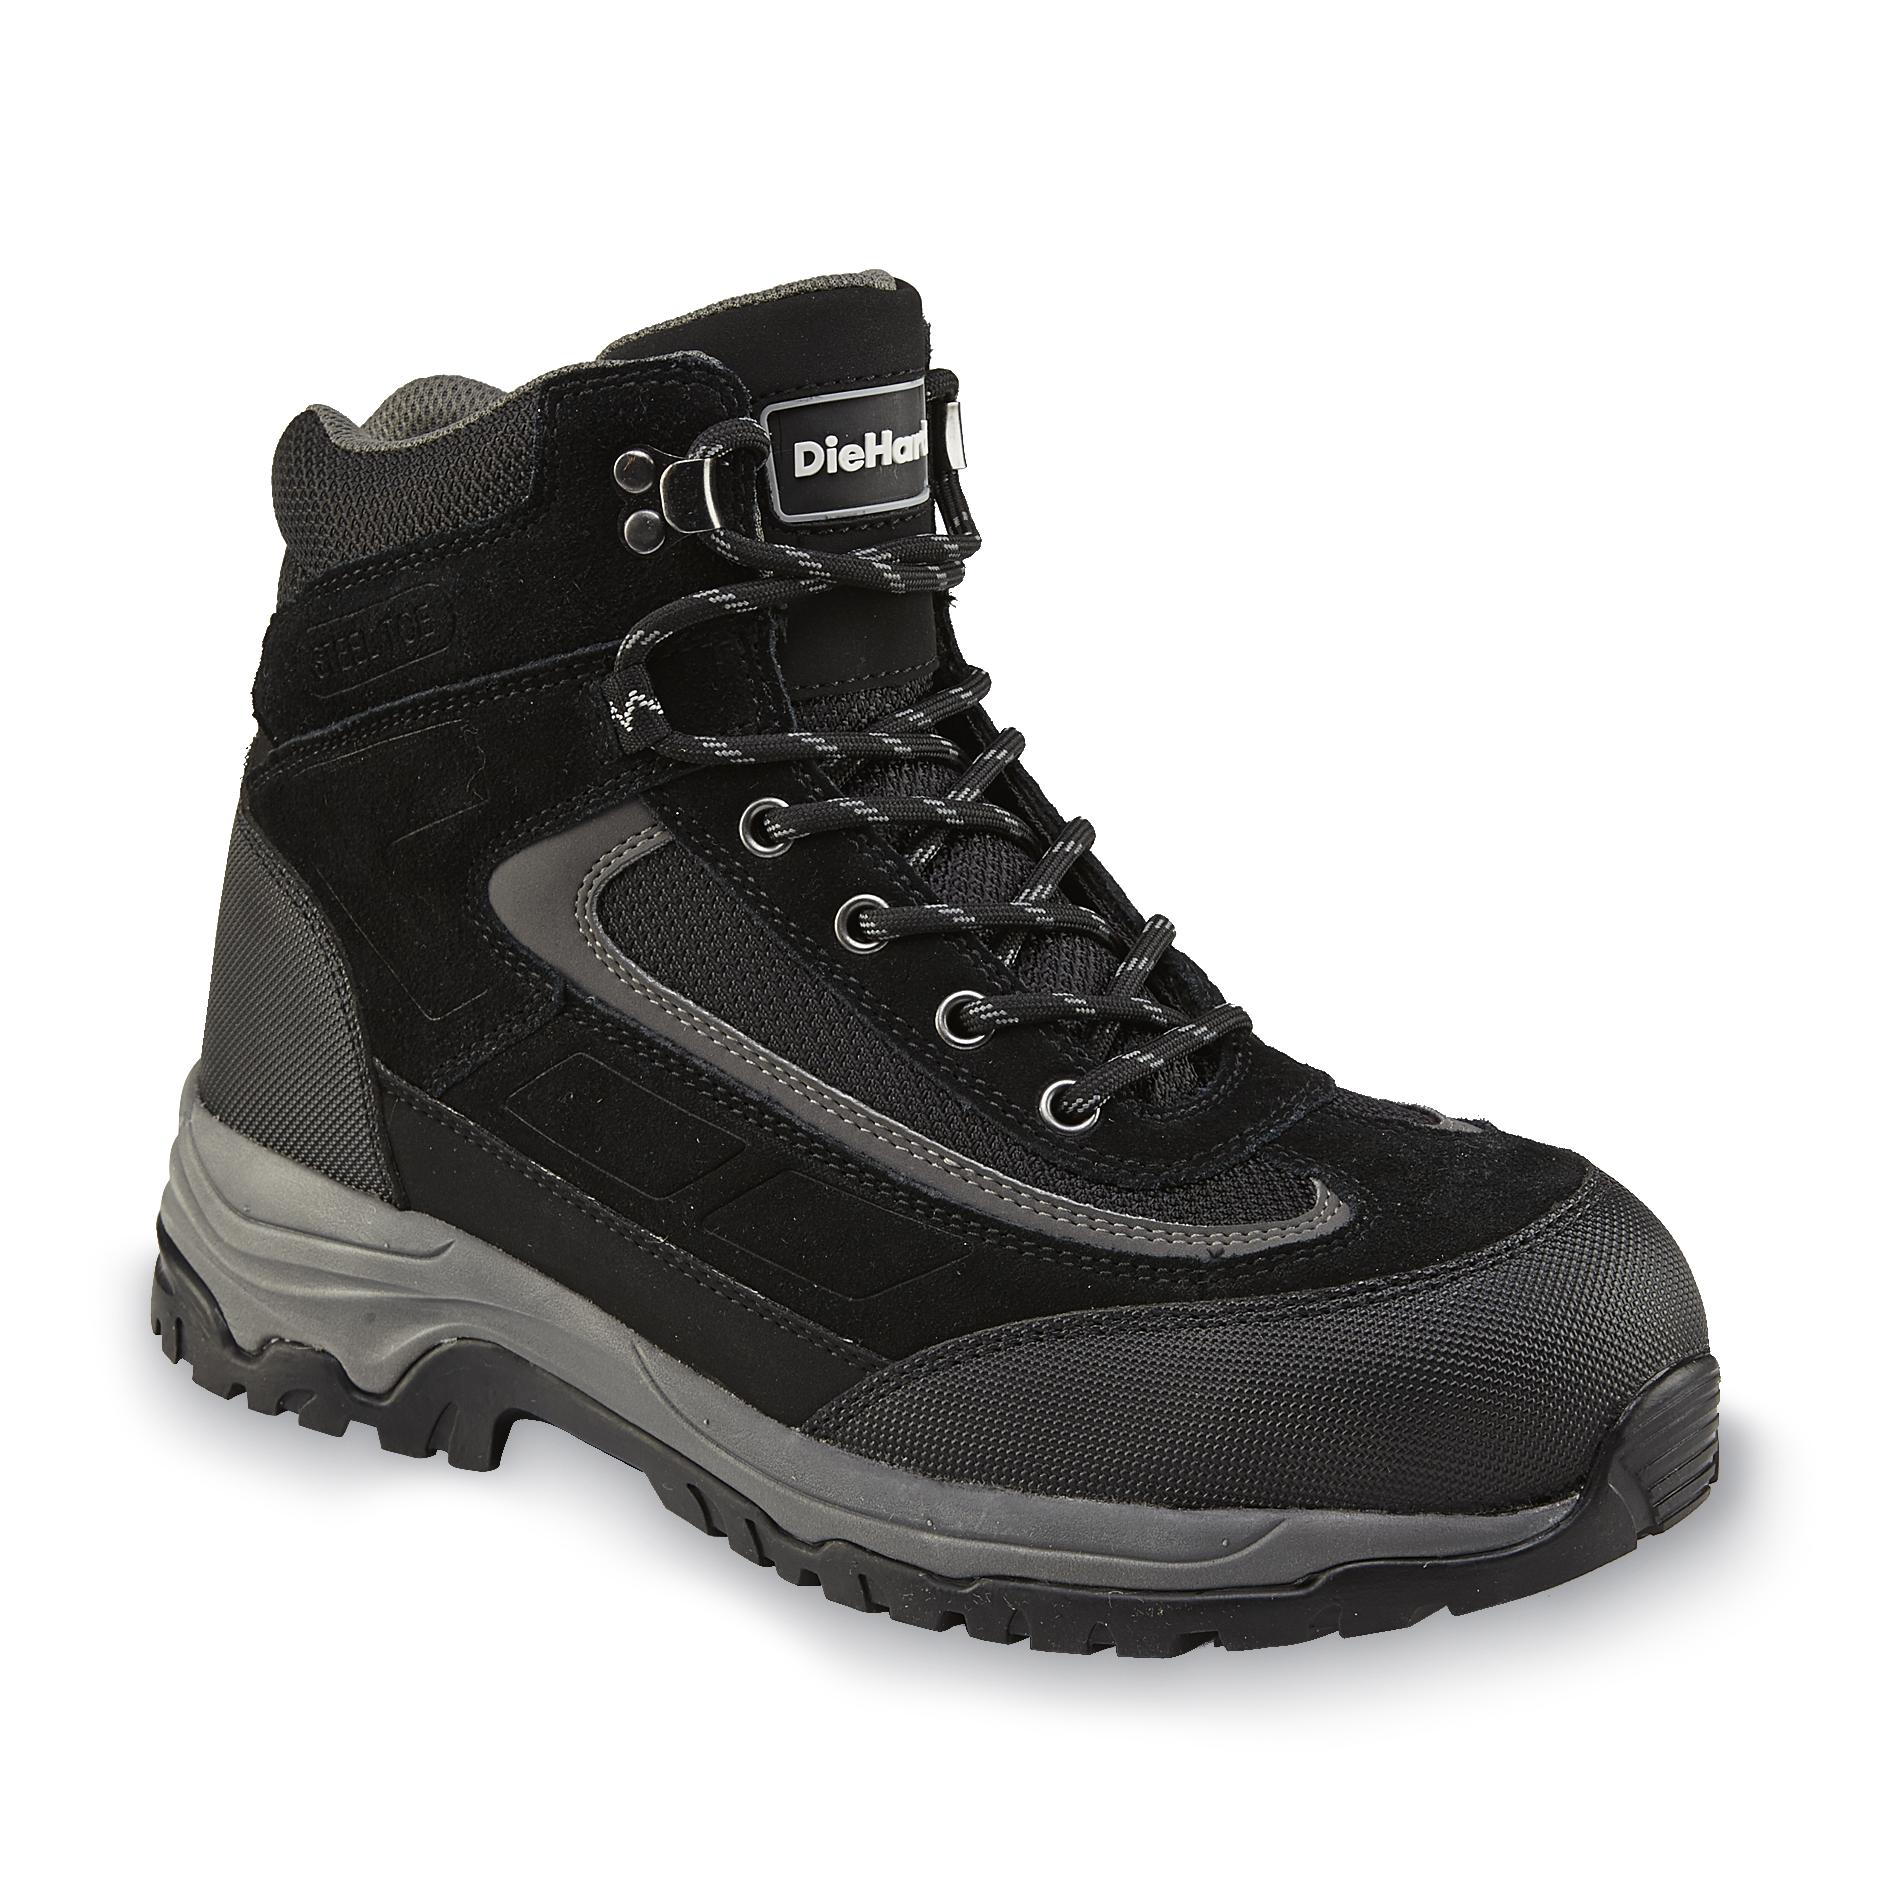 Steel toe work boots, Wide width boots